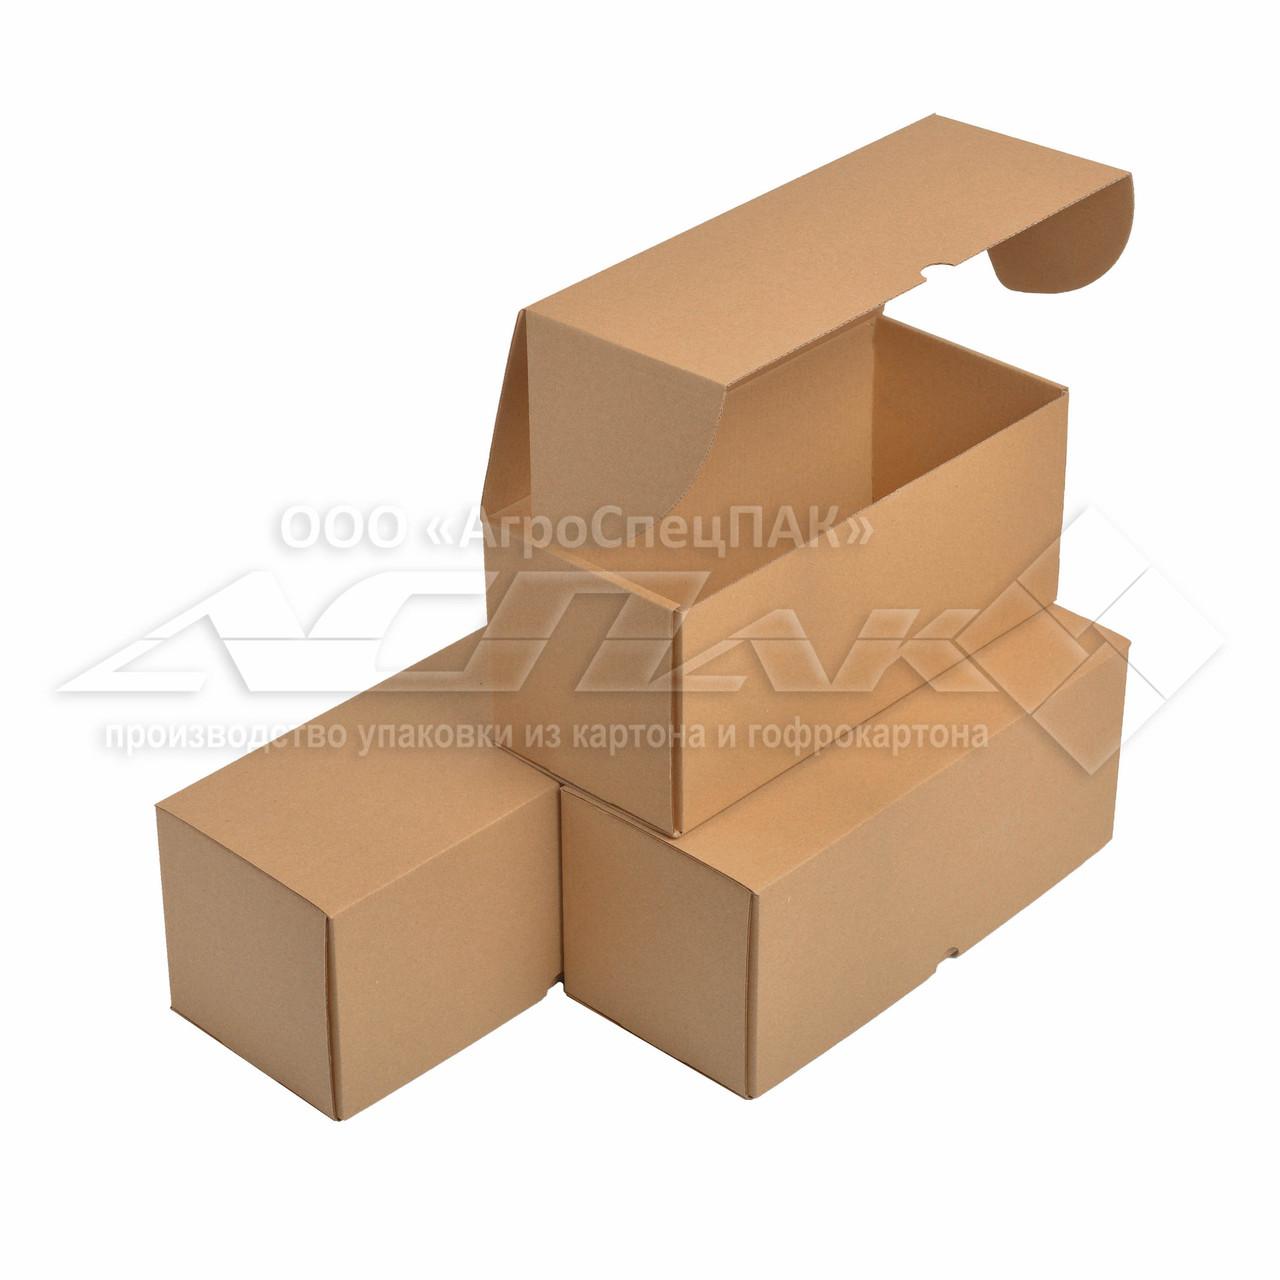 Картонные коробки 300х130х130 бурые из микрогофрокартона